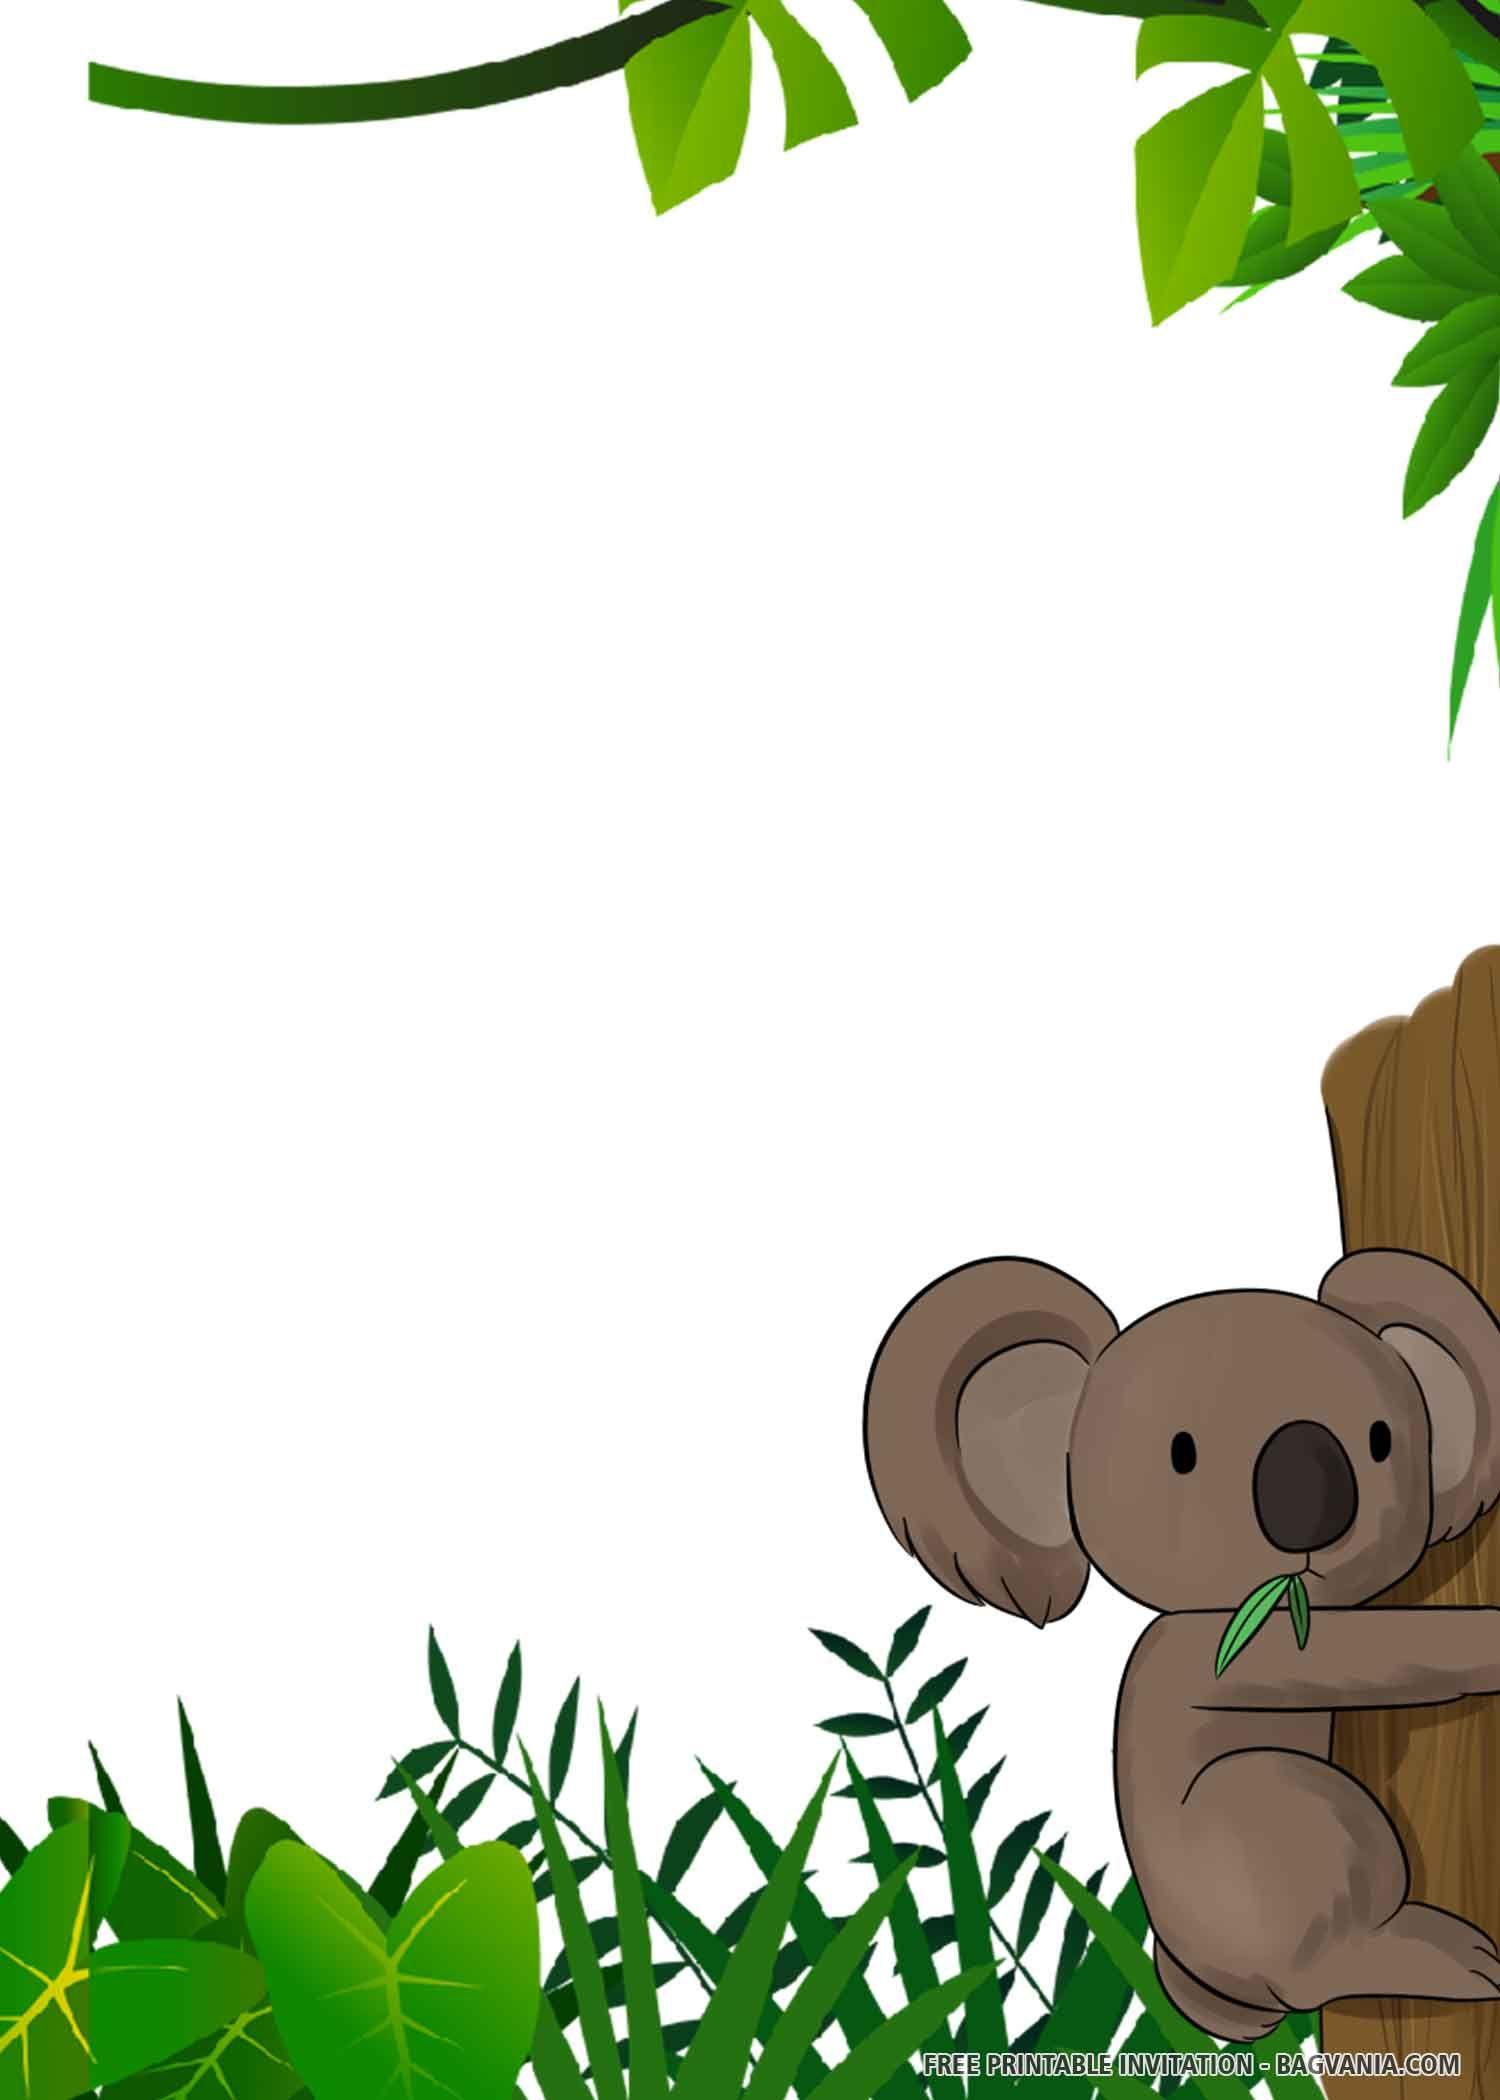 FREE PRINTABLE) – Cute Koala Birthday Invitation Templates in 5